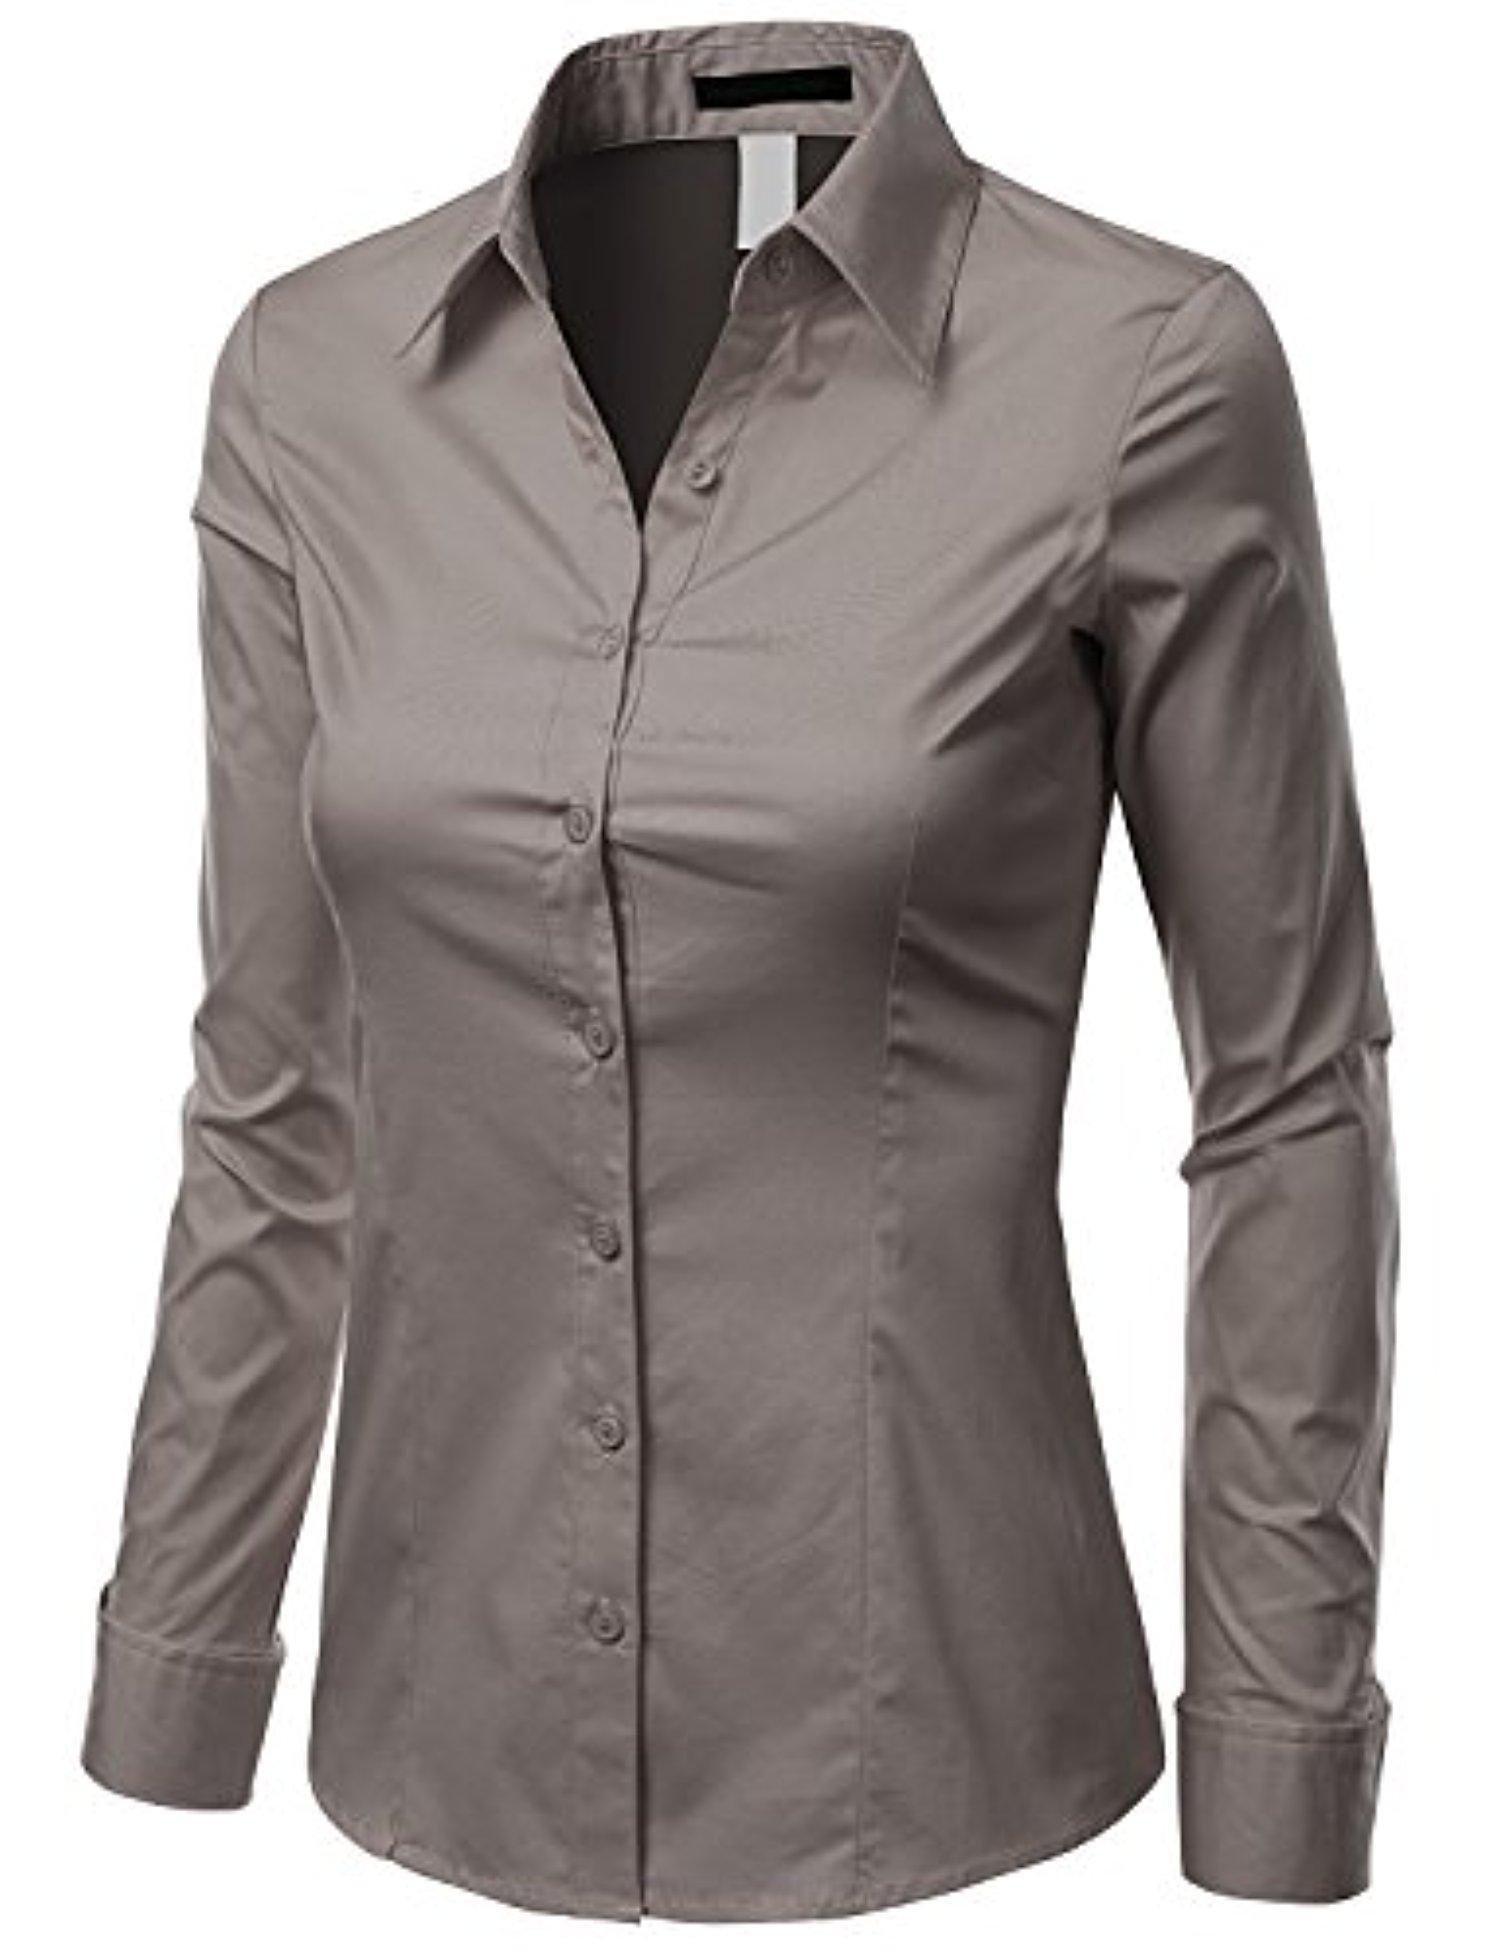 Doublju Us Xs Women Fashionable Long Sleeve Slim Fit Button Down Shirt Gray 1x Basic Long Sleeve Spandex Shirts Fashion [ 1953 x 1500 Pixel ]